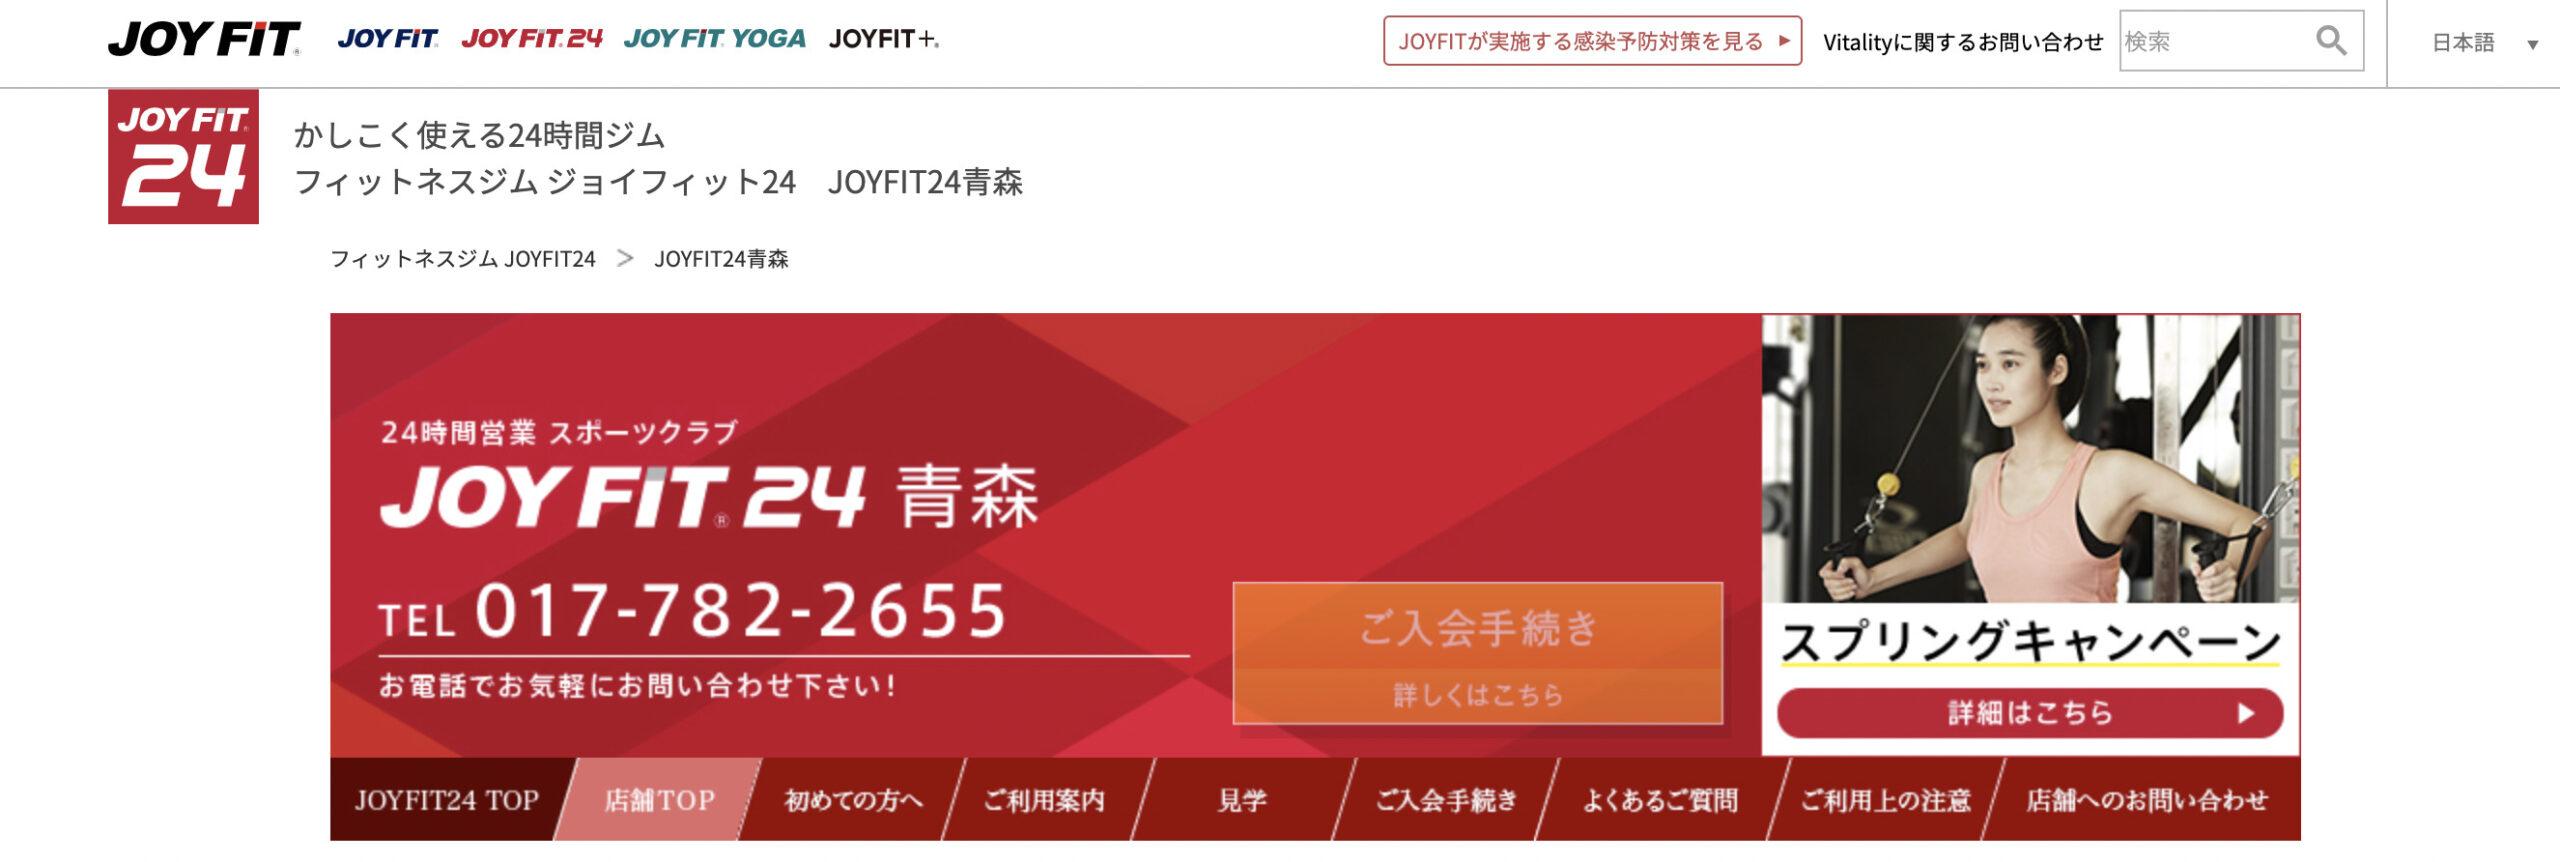 JOY FIT 24青森